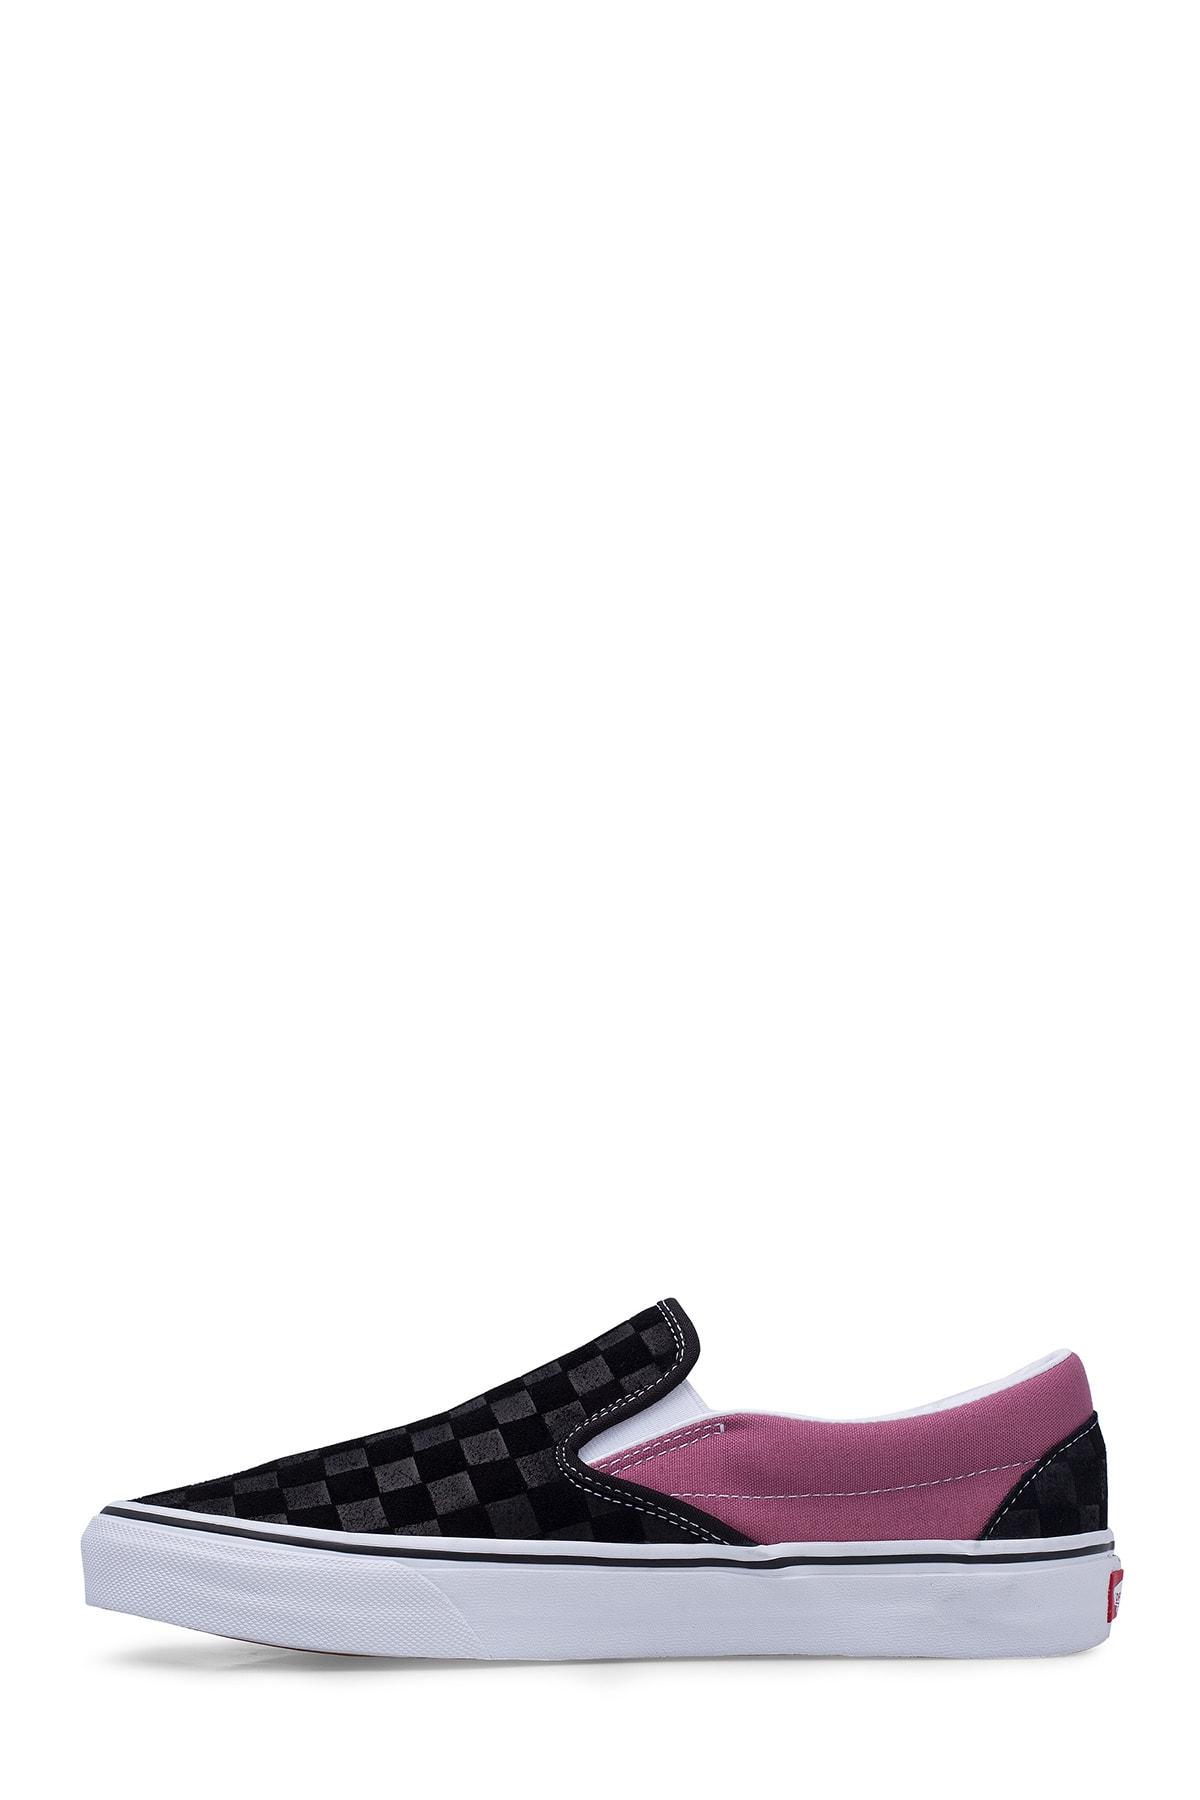 Vans UA CLASSIC SLIP-ON Siyah Erkek Slip On Ayakkabı 100583585 2